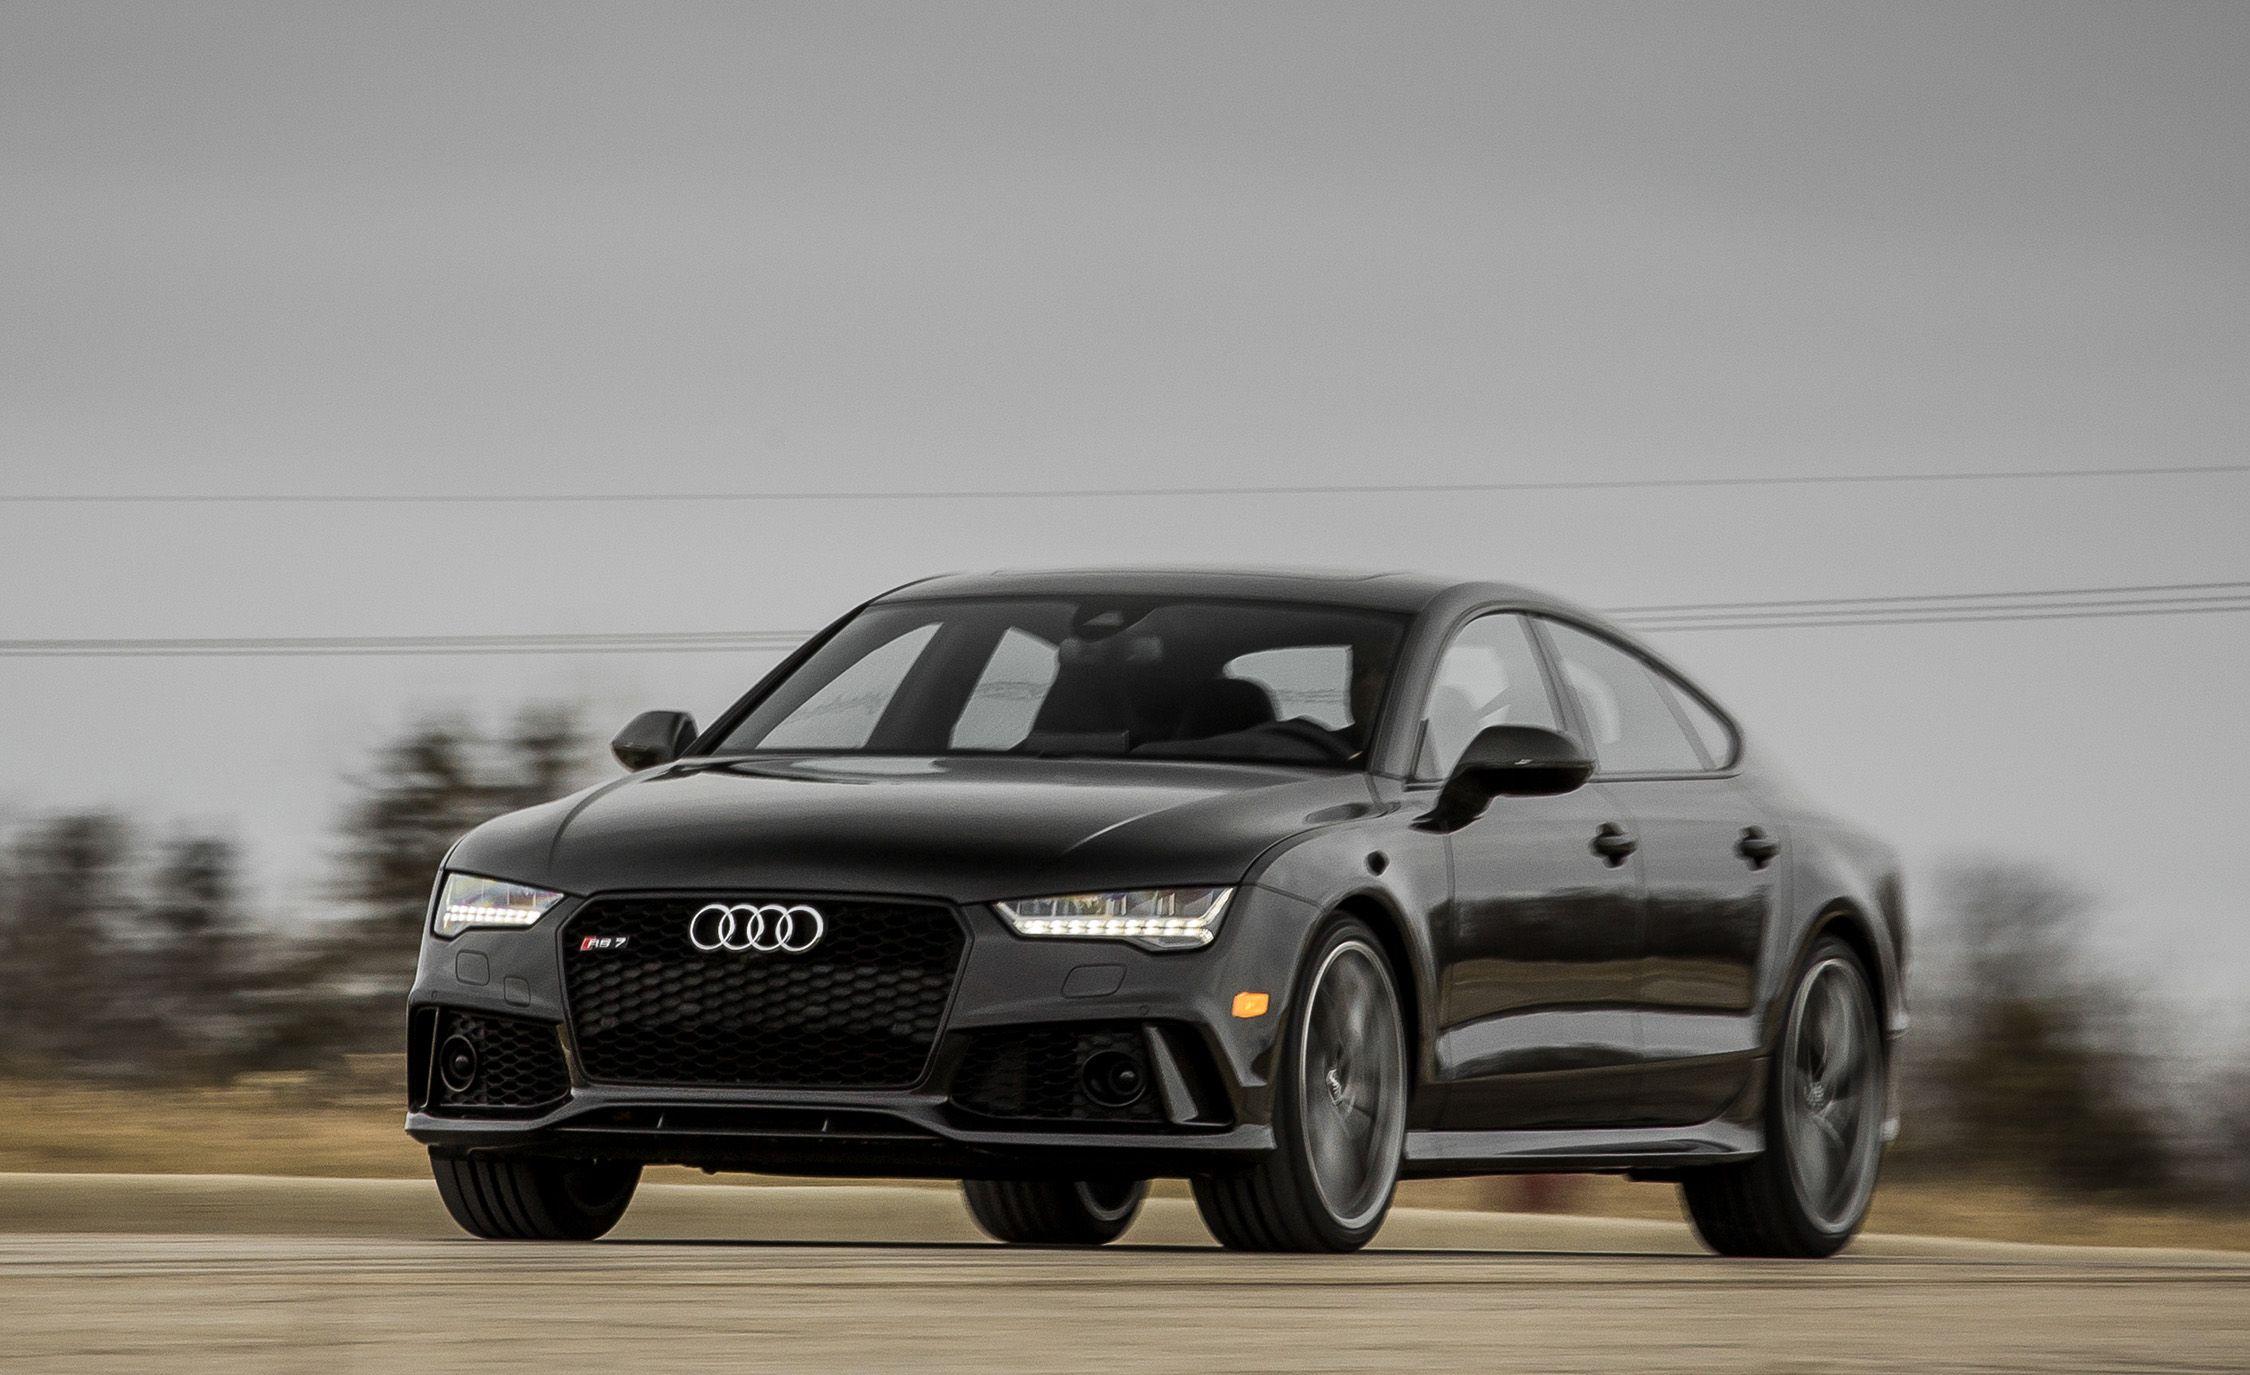 Marvelous 2017 Audi RS7 Performance